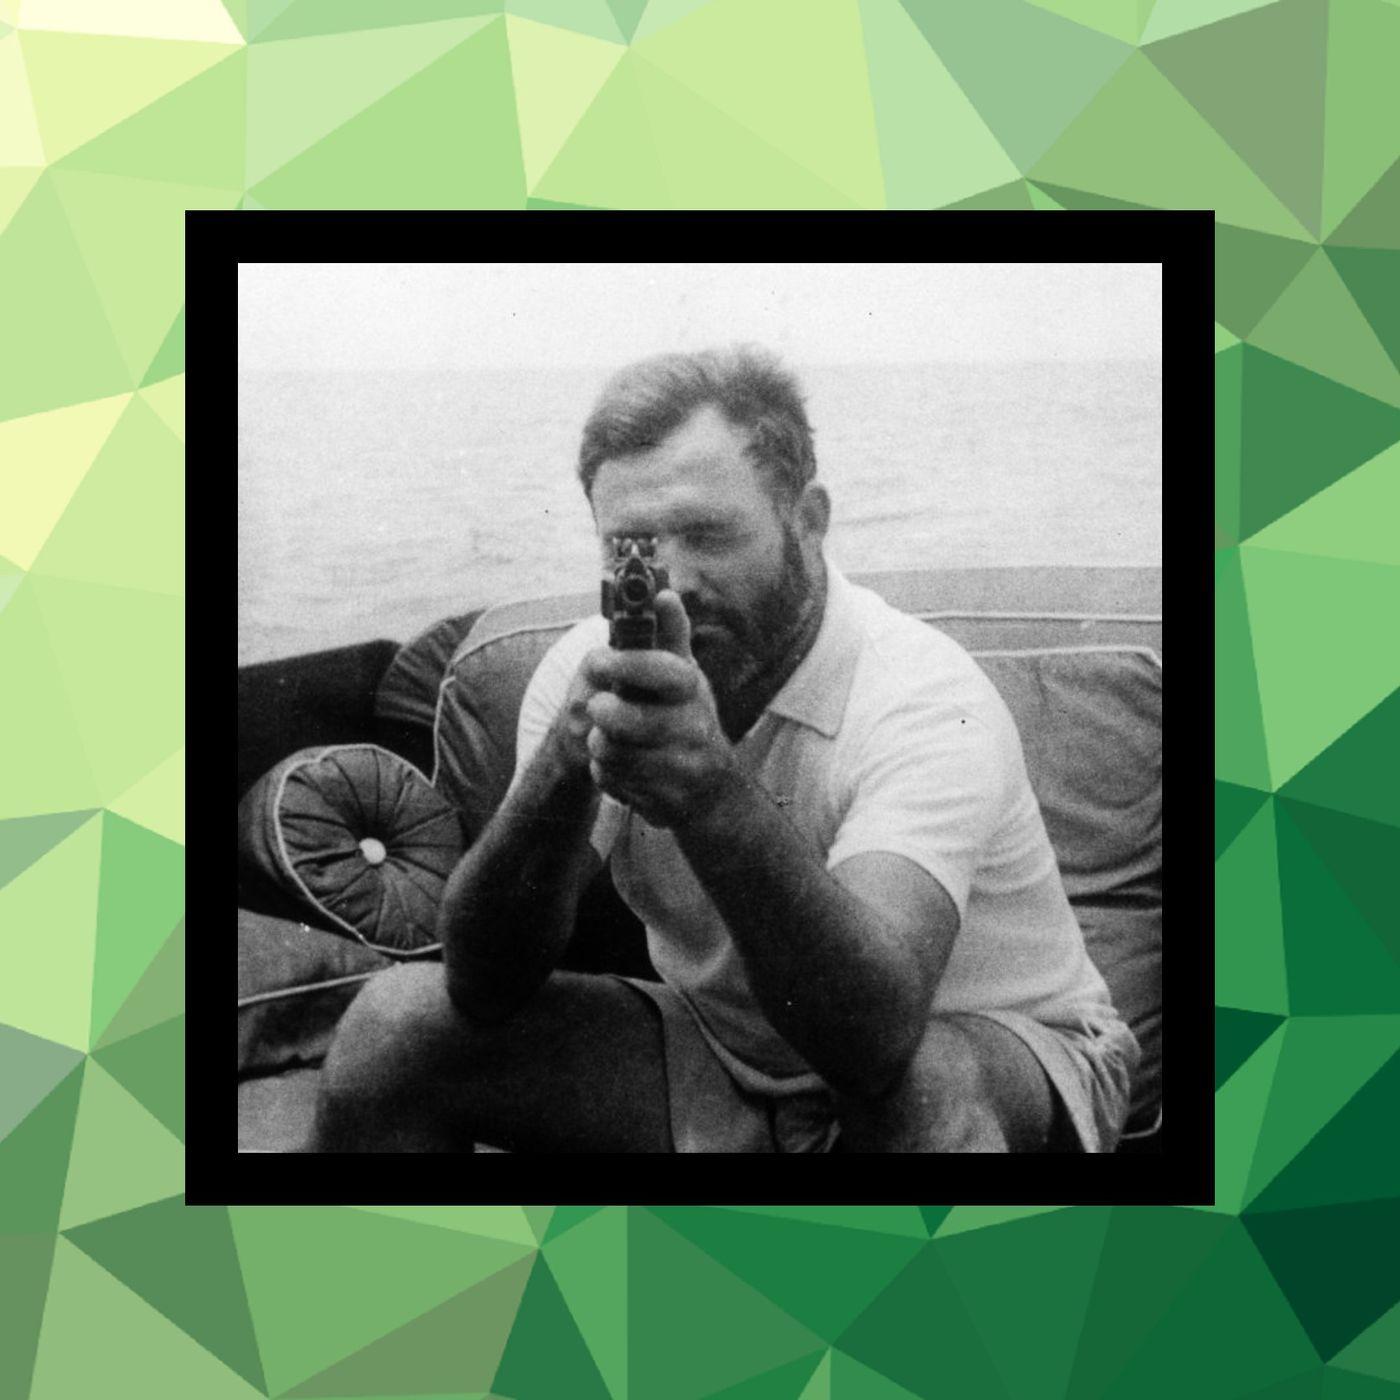 114 - Ernest Hemingway, cazador de nazis